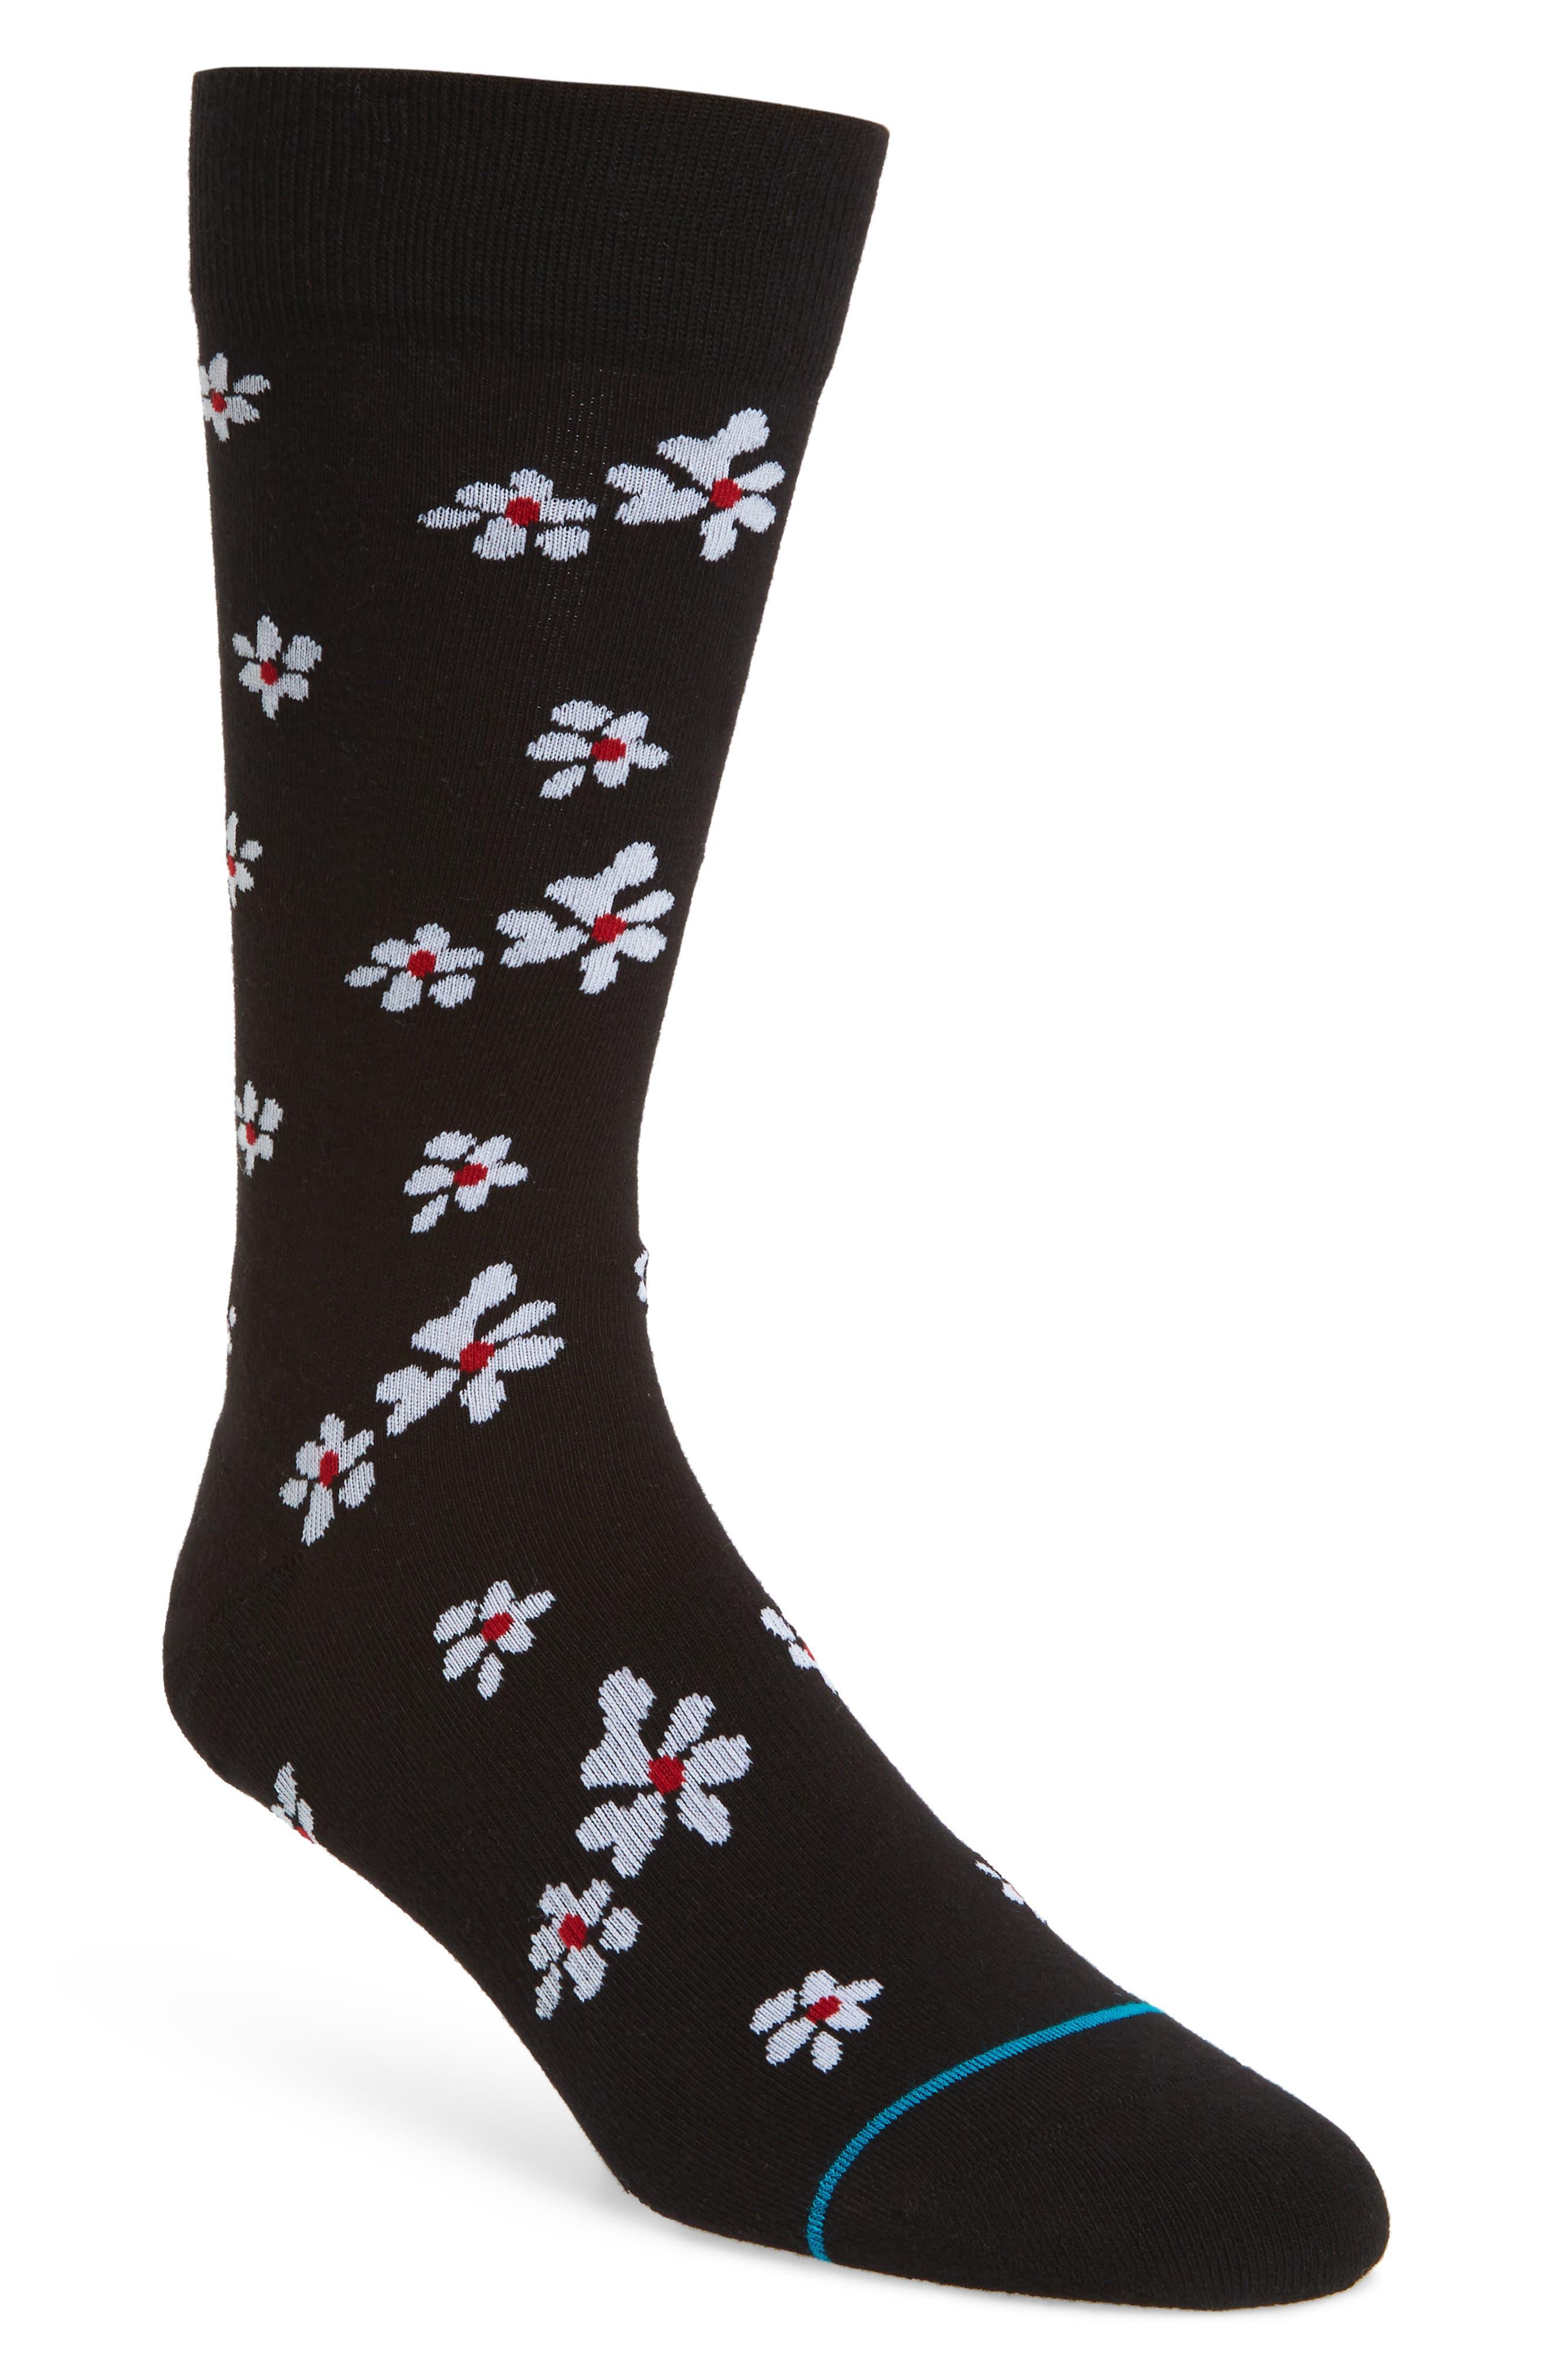 Hendriksen Crew Socks,                         Main,                         color, Black